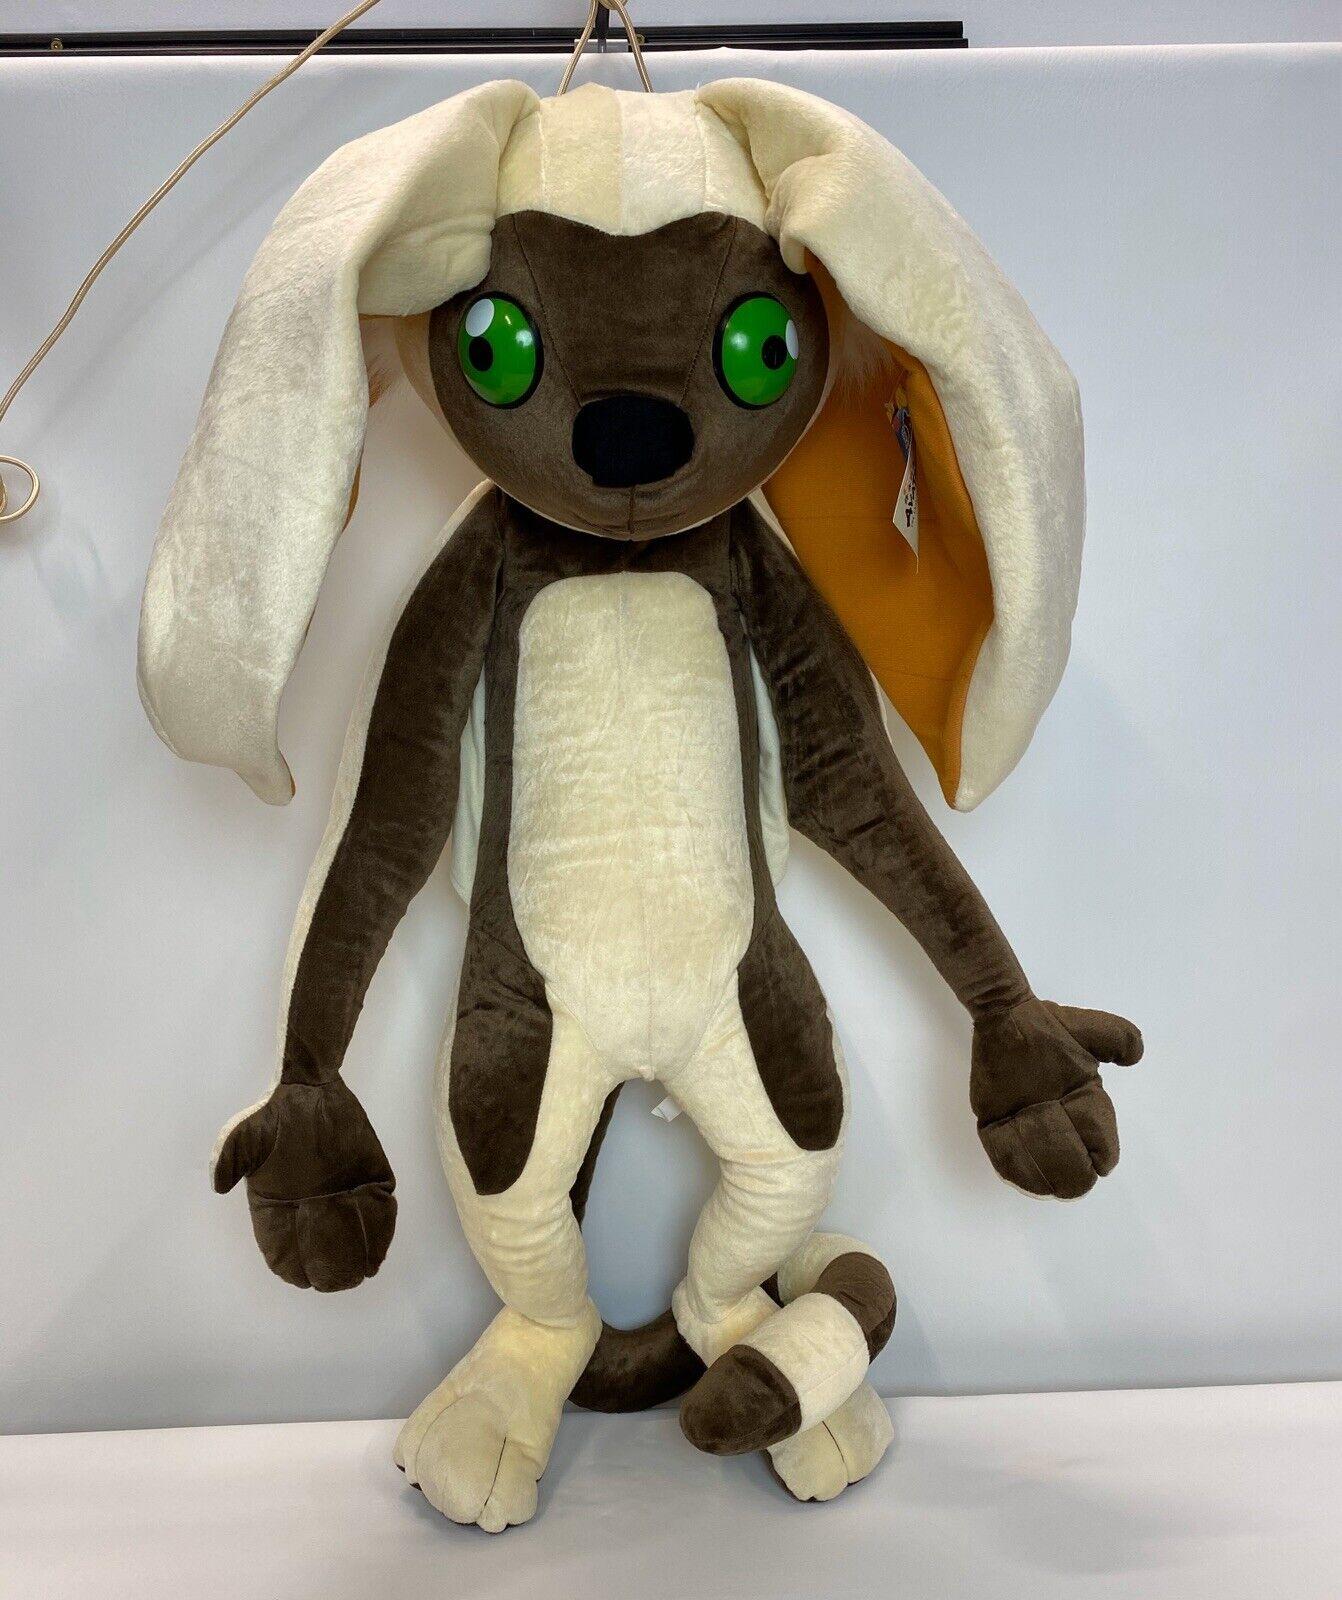 MOMO Avatar The Last Airbender Stuffed Animal 4-Foot RARE  2005 Preowned